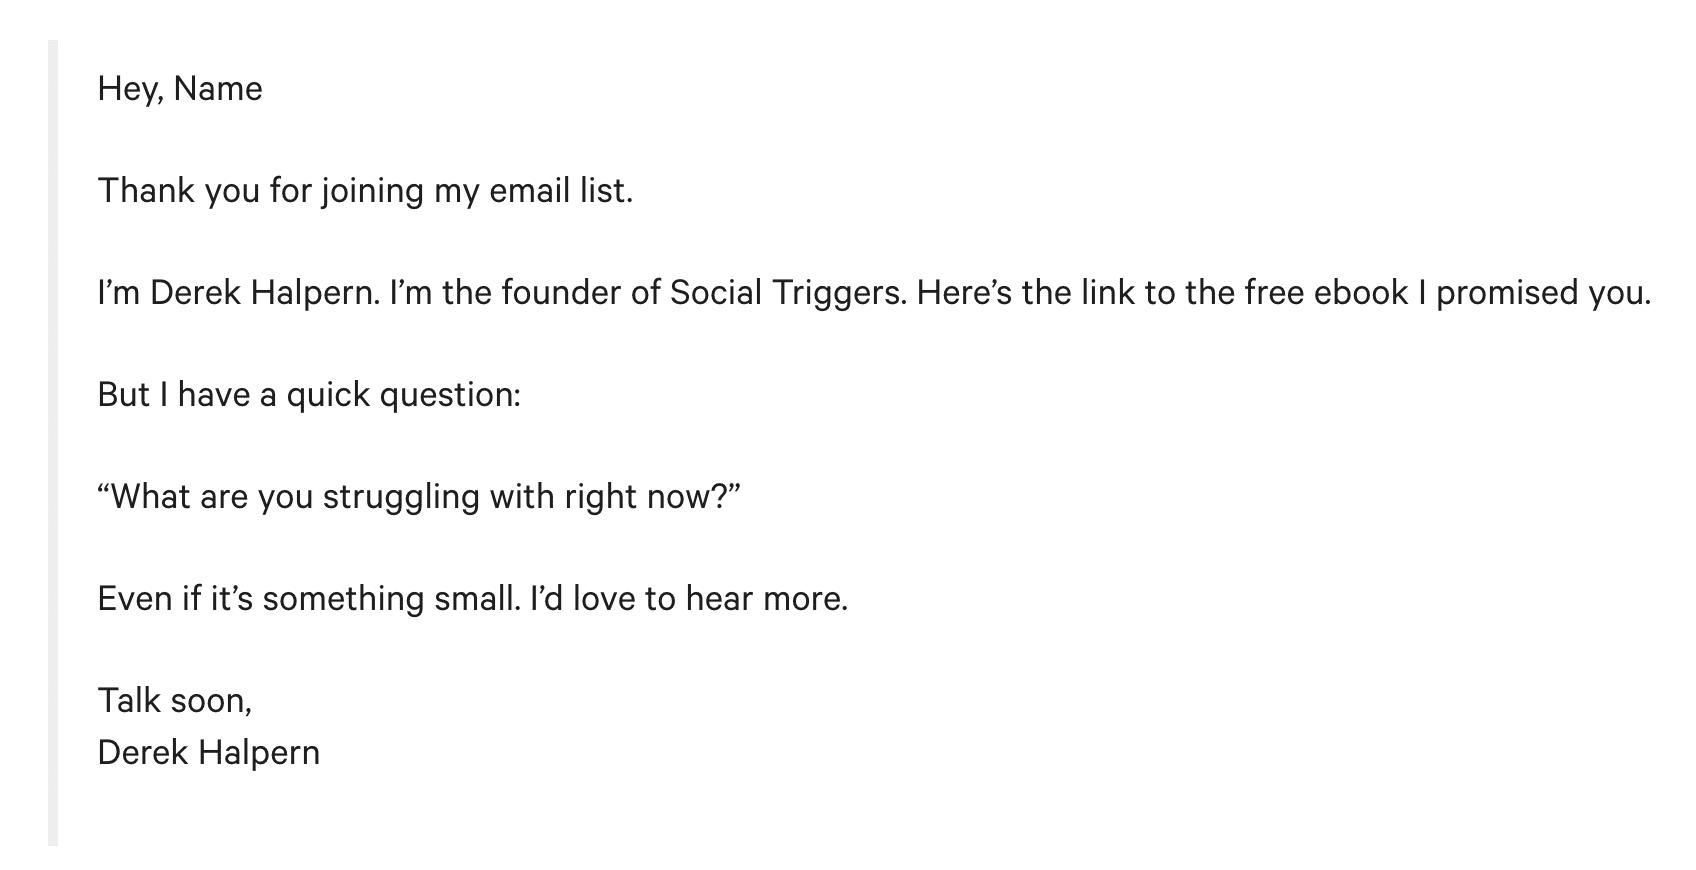 Esempio di email di benvenuto di Mailchimp